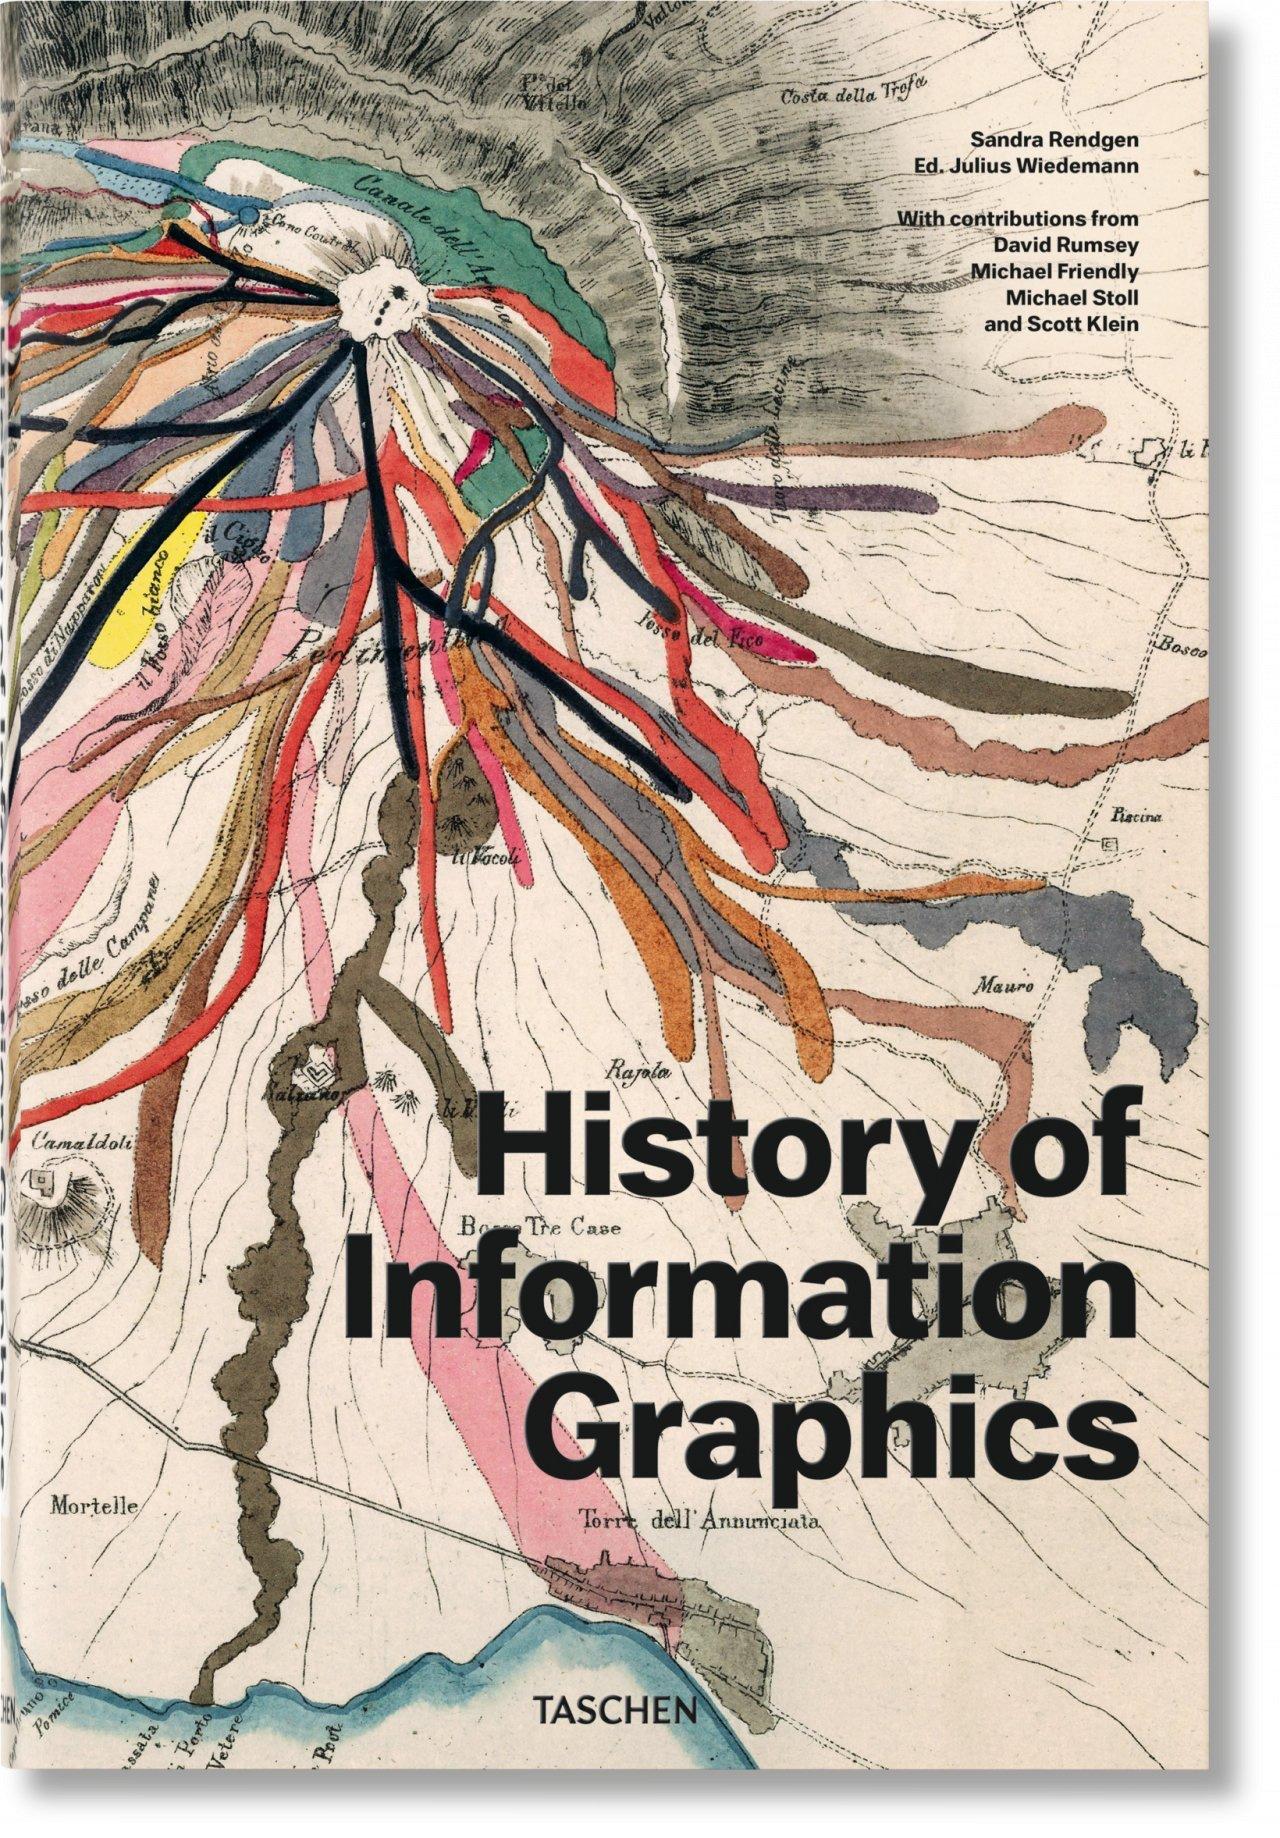 History of Information Graphics - Rendgen Sandra